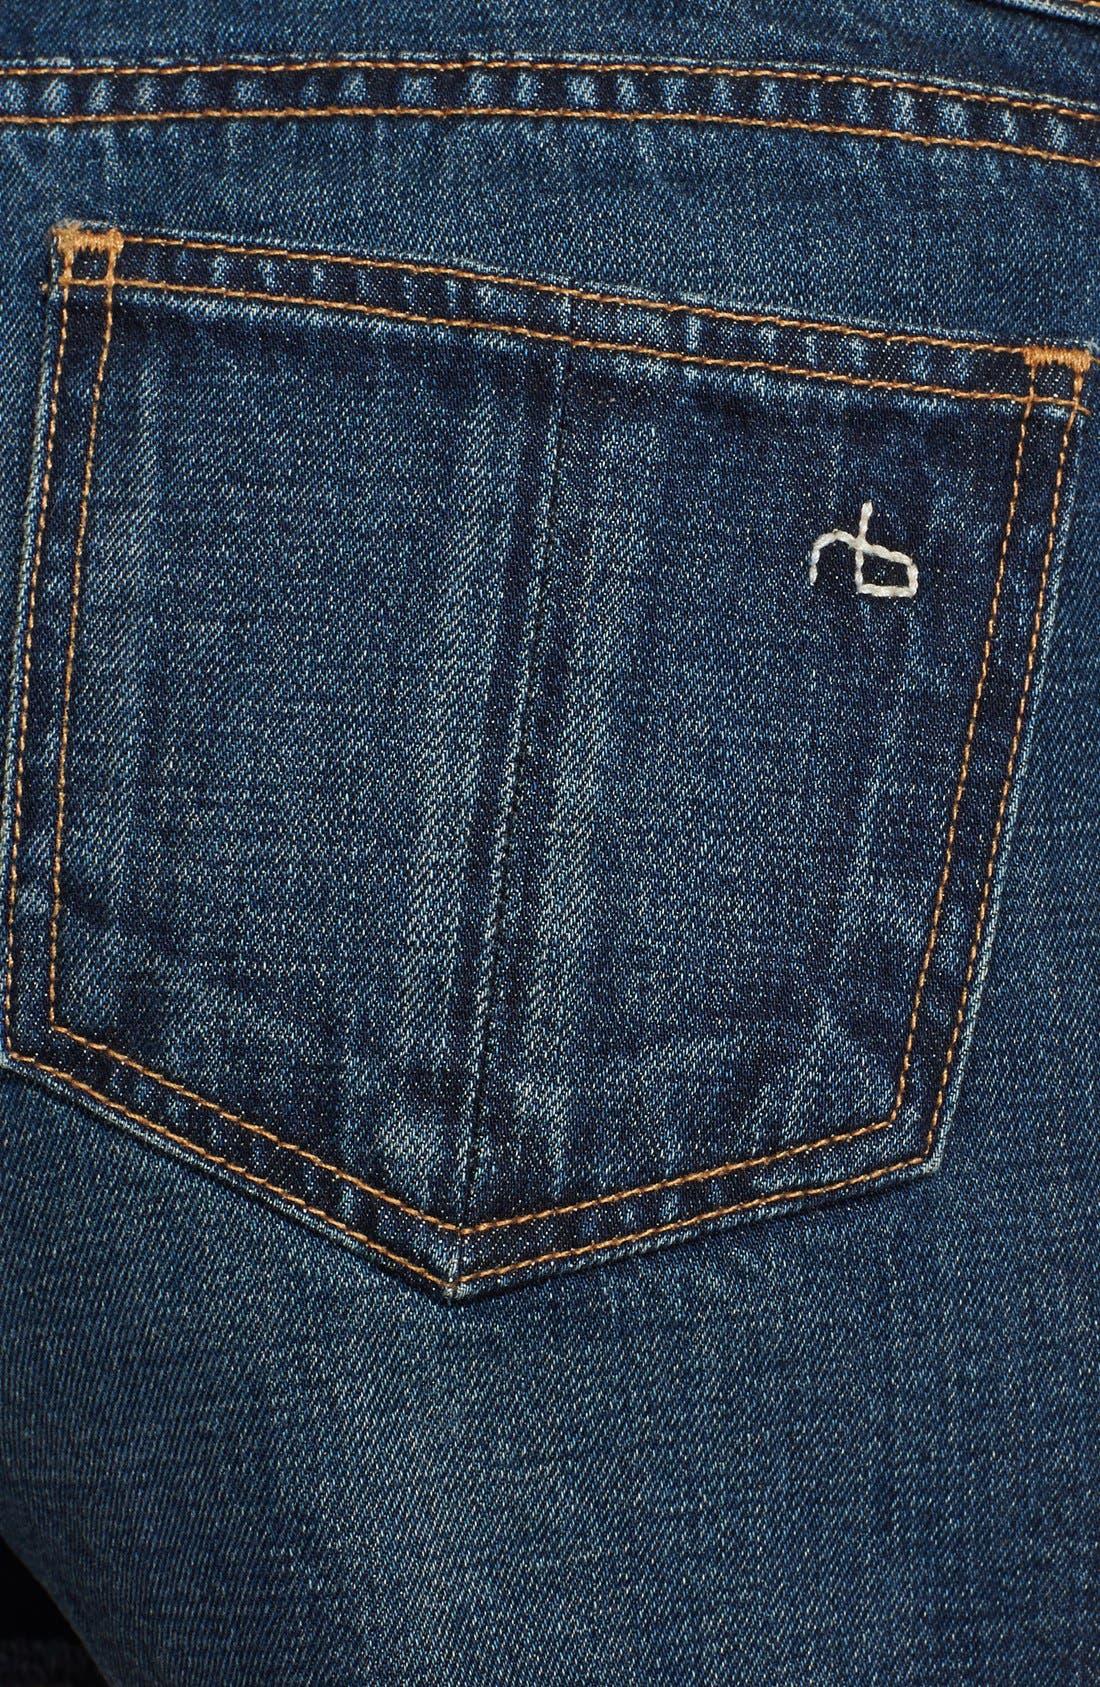 Alternate Image 3  - rag & bone/JEAN 'The Mila' Denim Cutoff Shorts (Doheny)